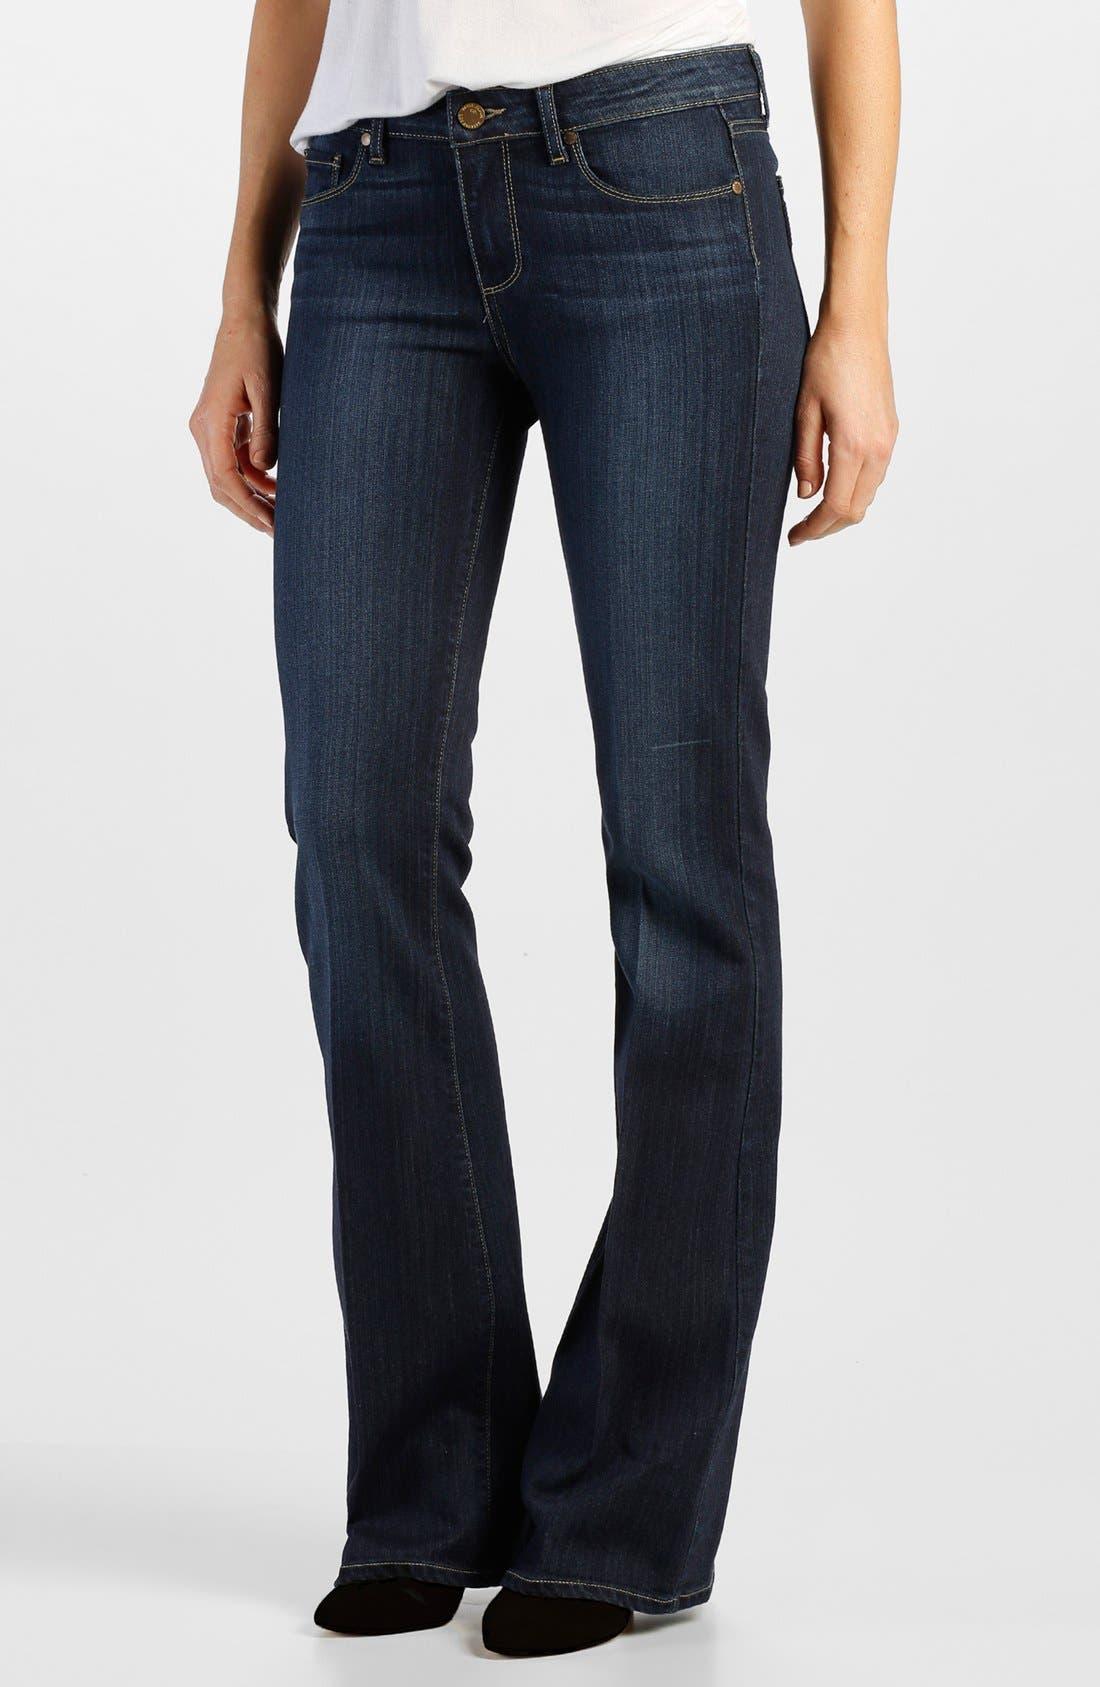 Alternate Image 1 Selected - Paige Denim 'Skyline' Bootcut Jeans (Alanis)